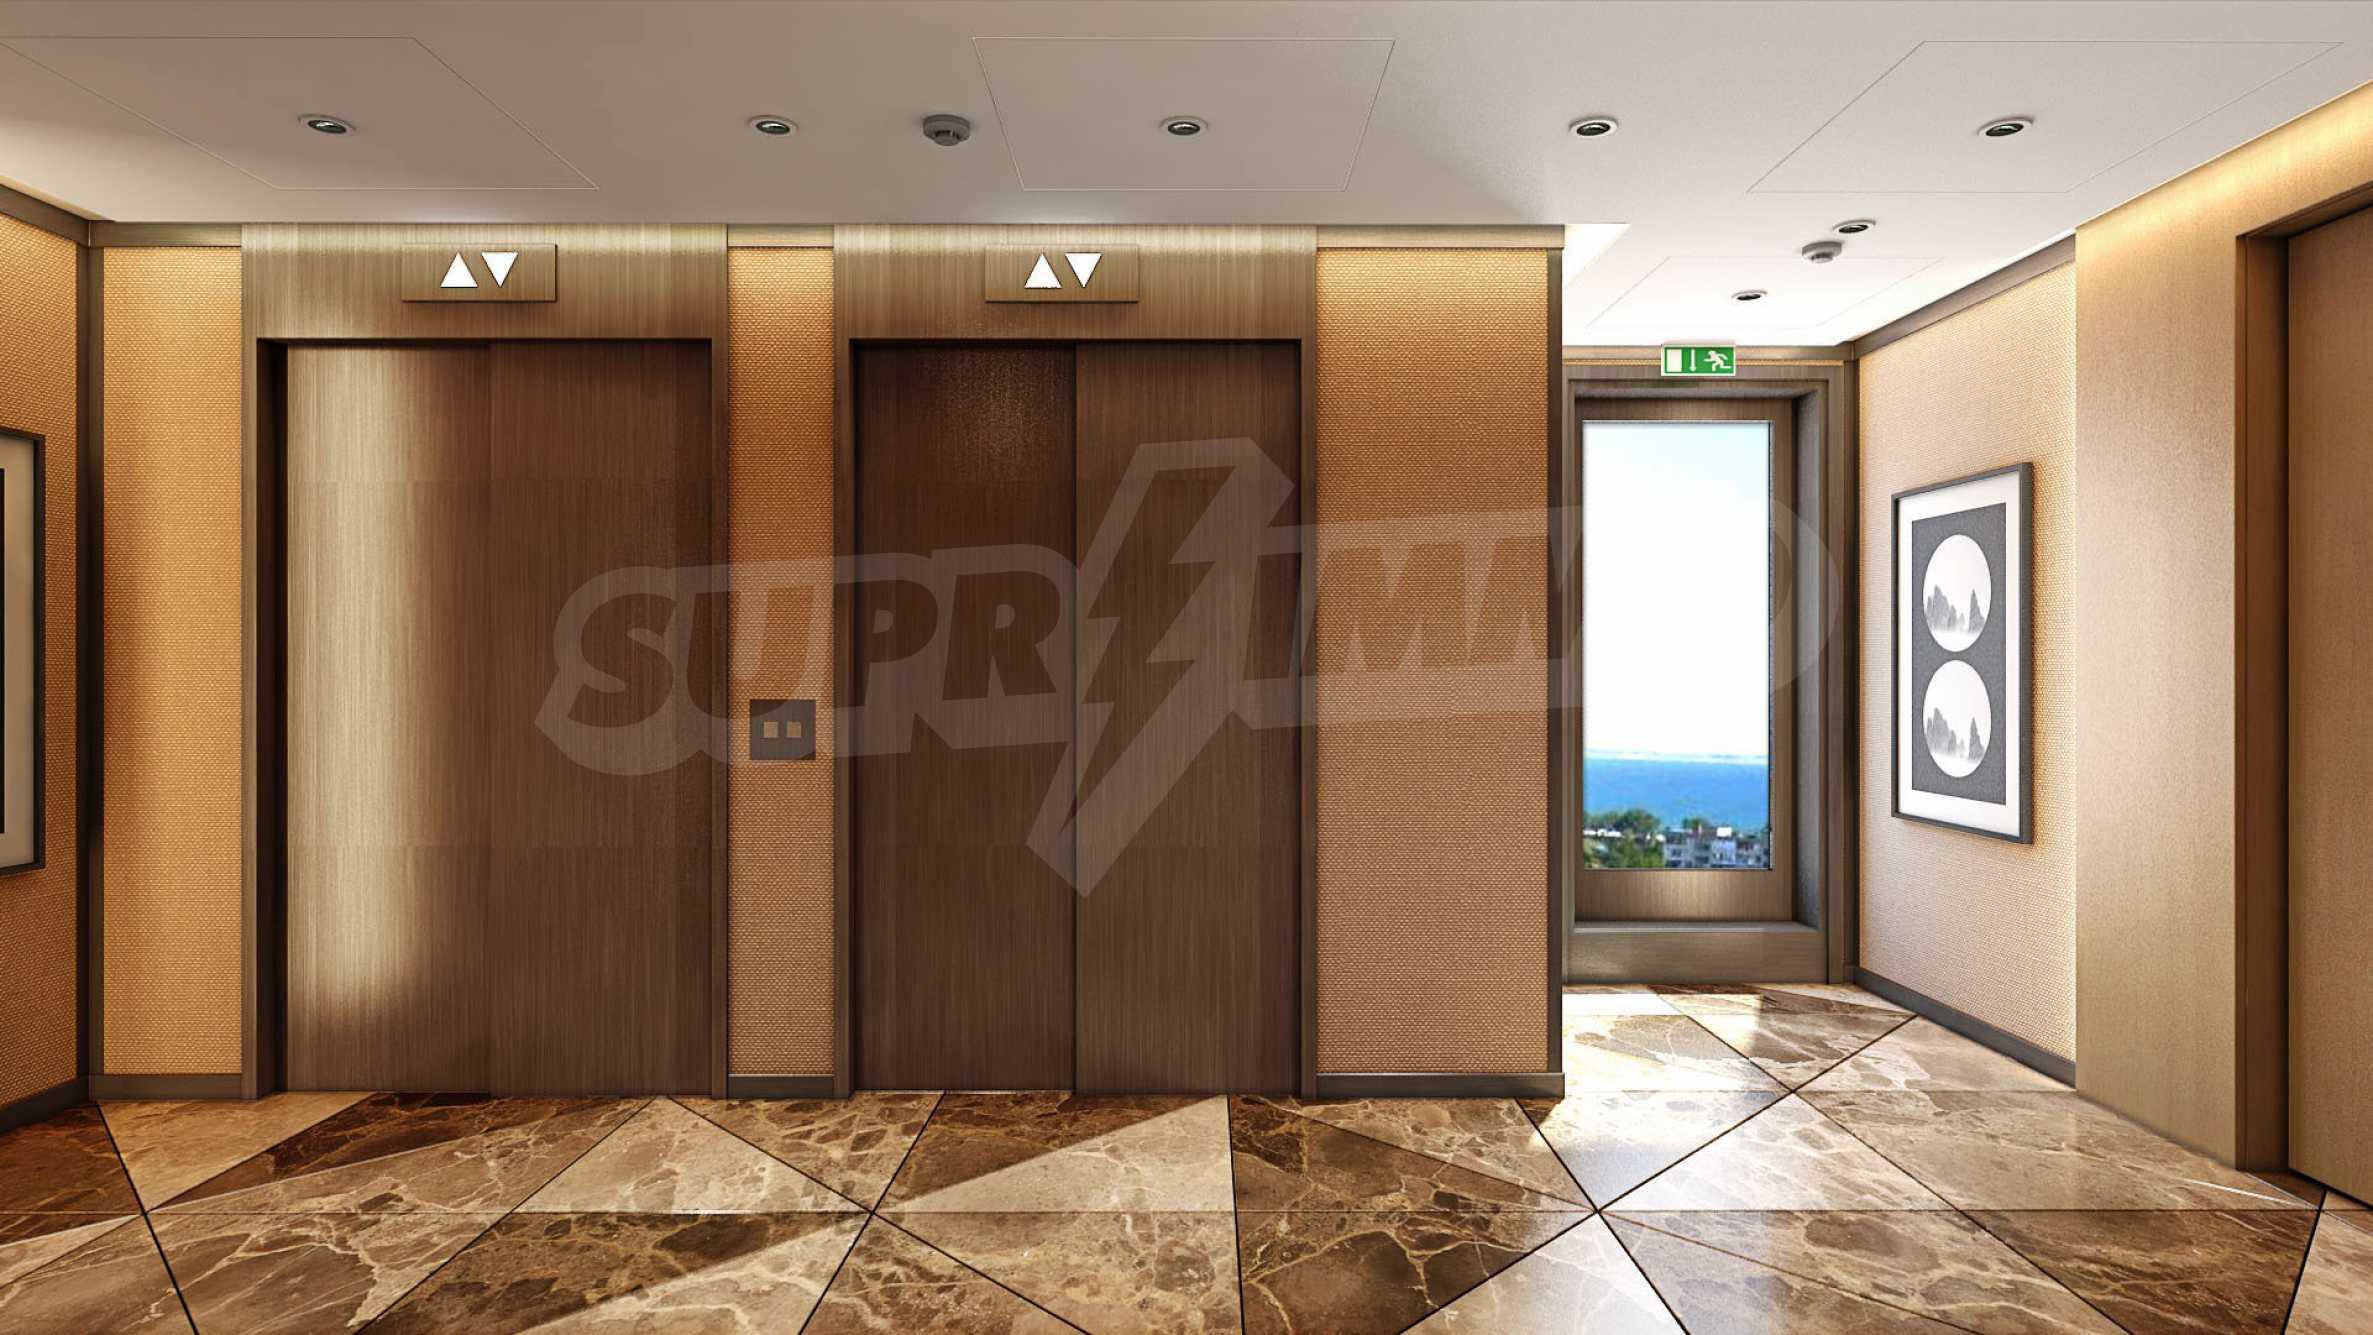 Нова сграда с луксозни апартаменти в гр. Бургас 3